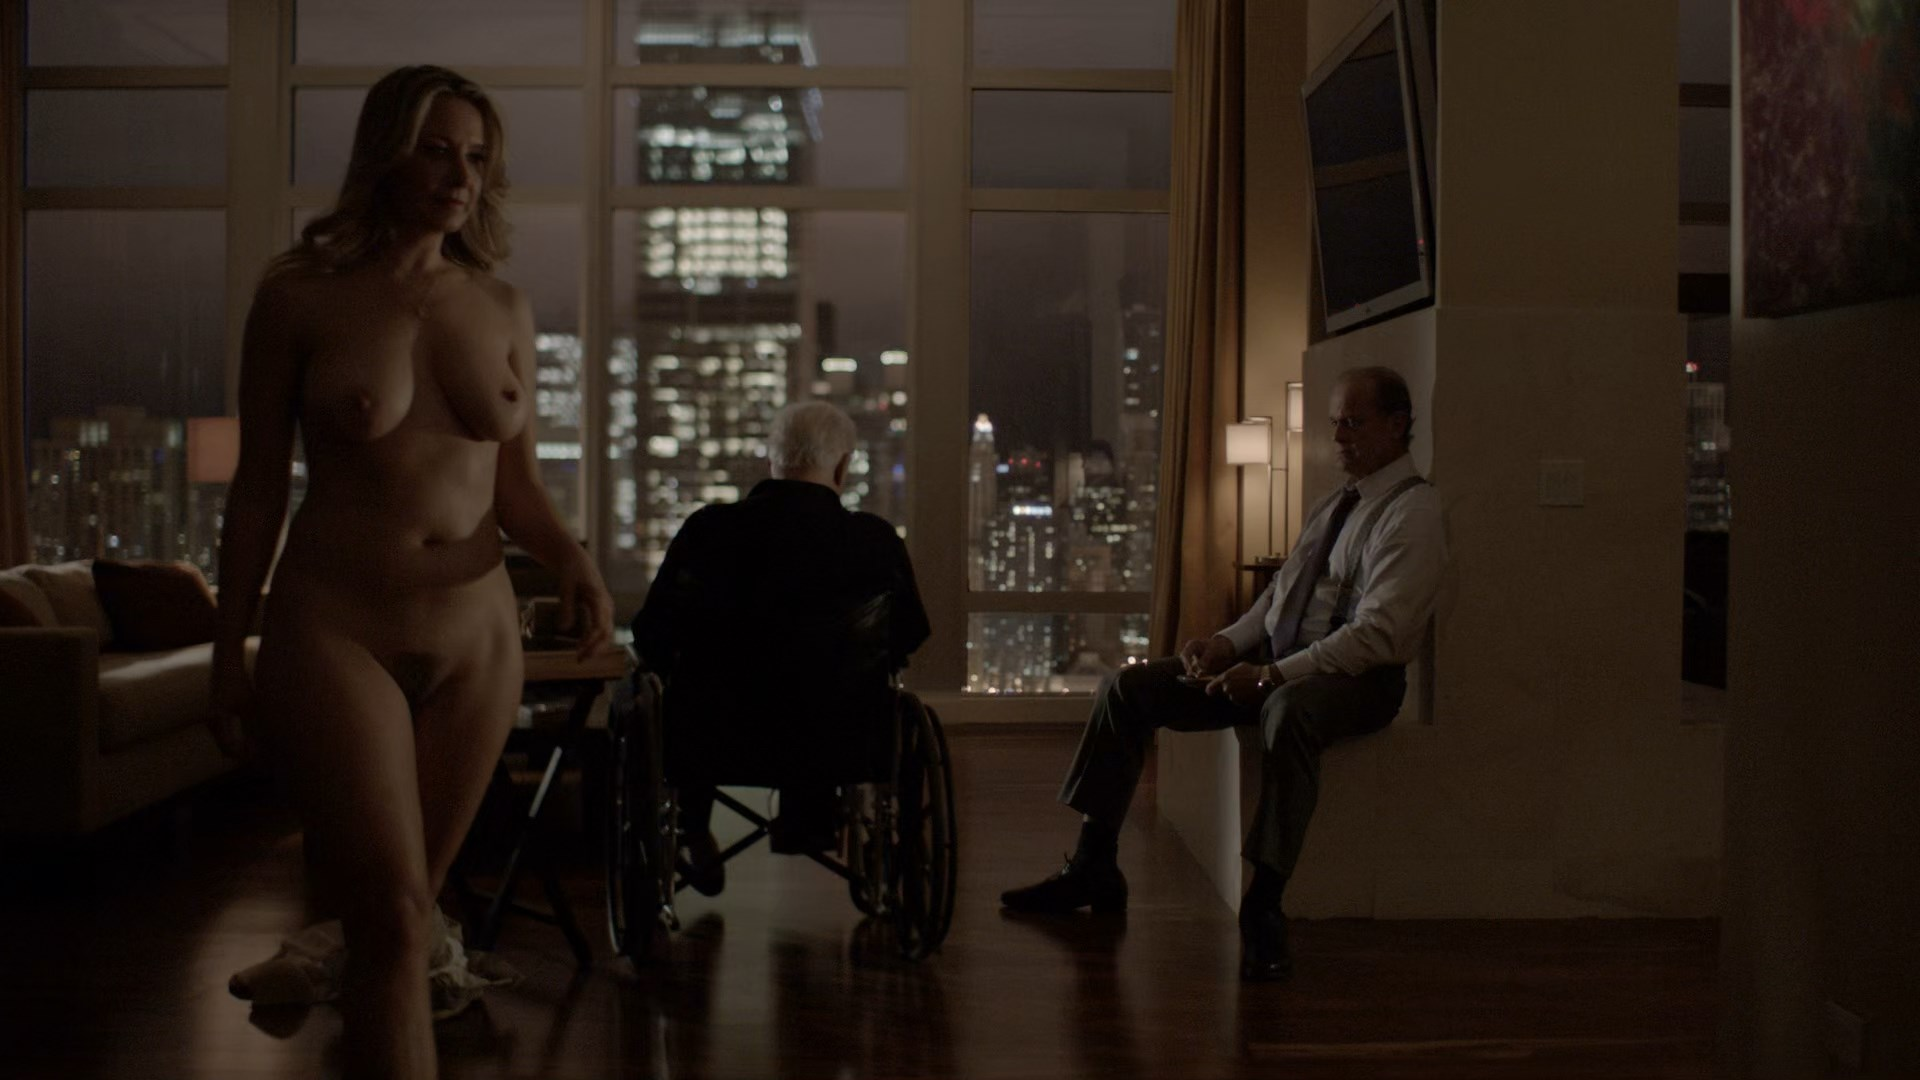 Jennifer irwin nude scene